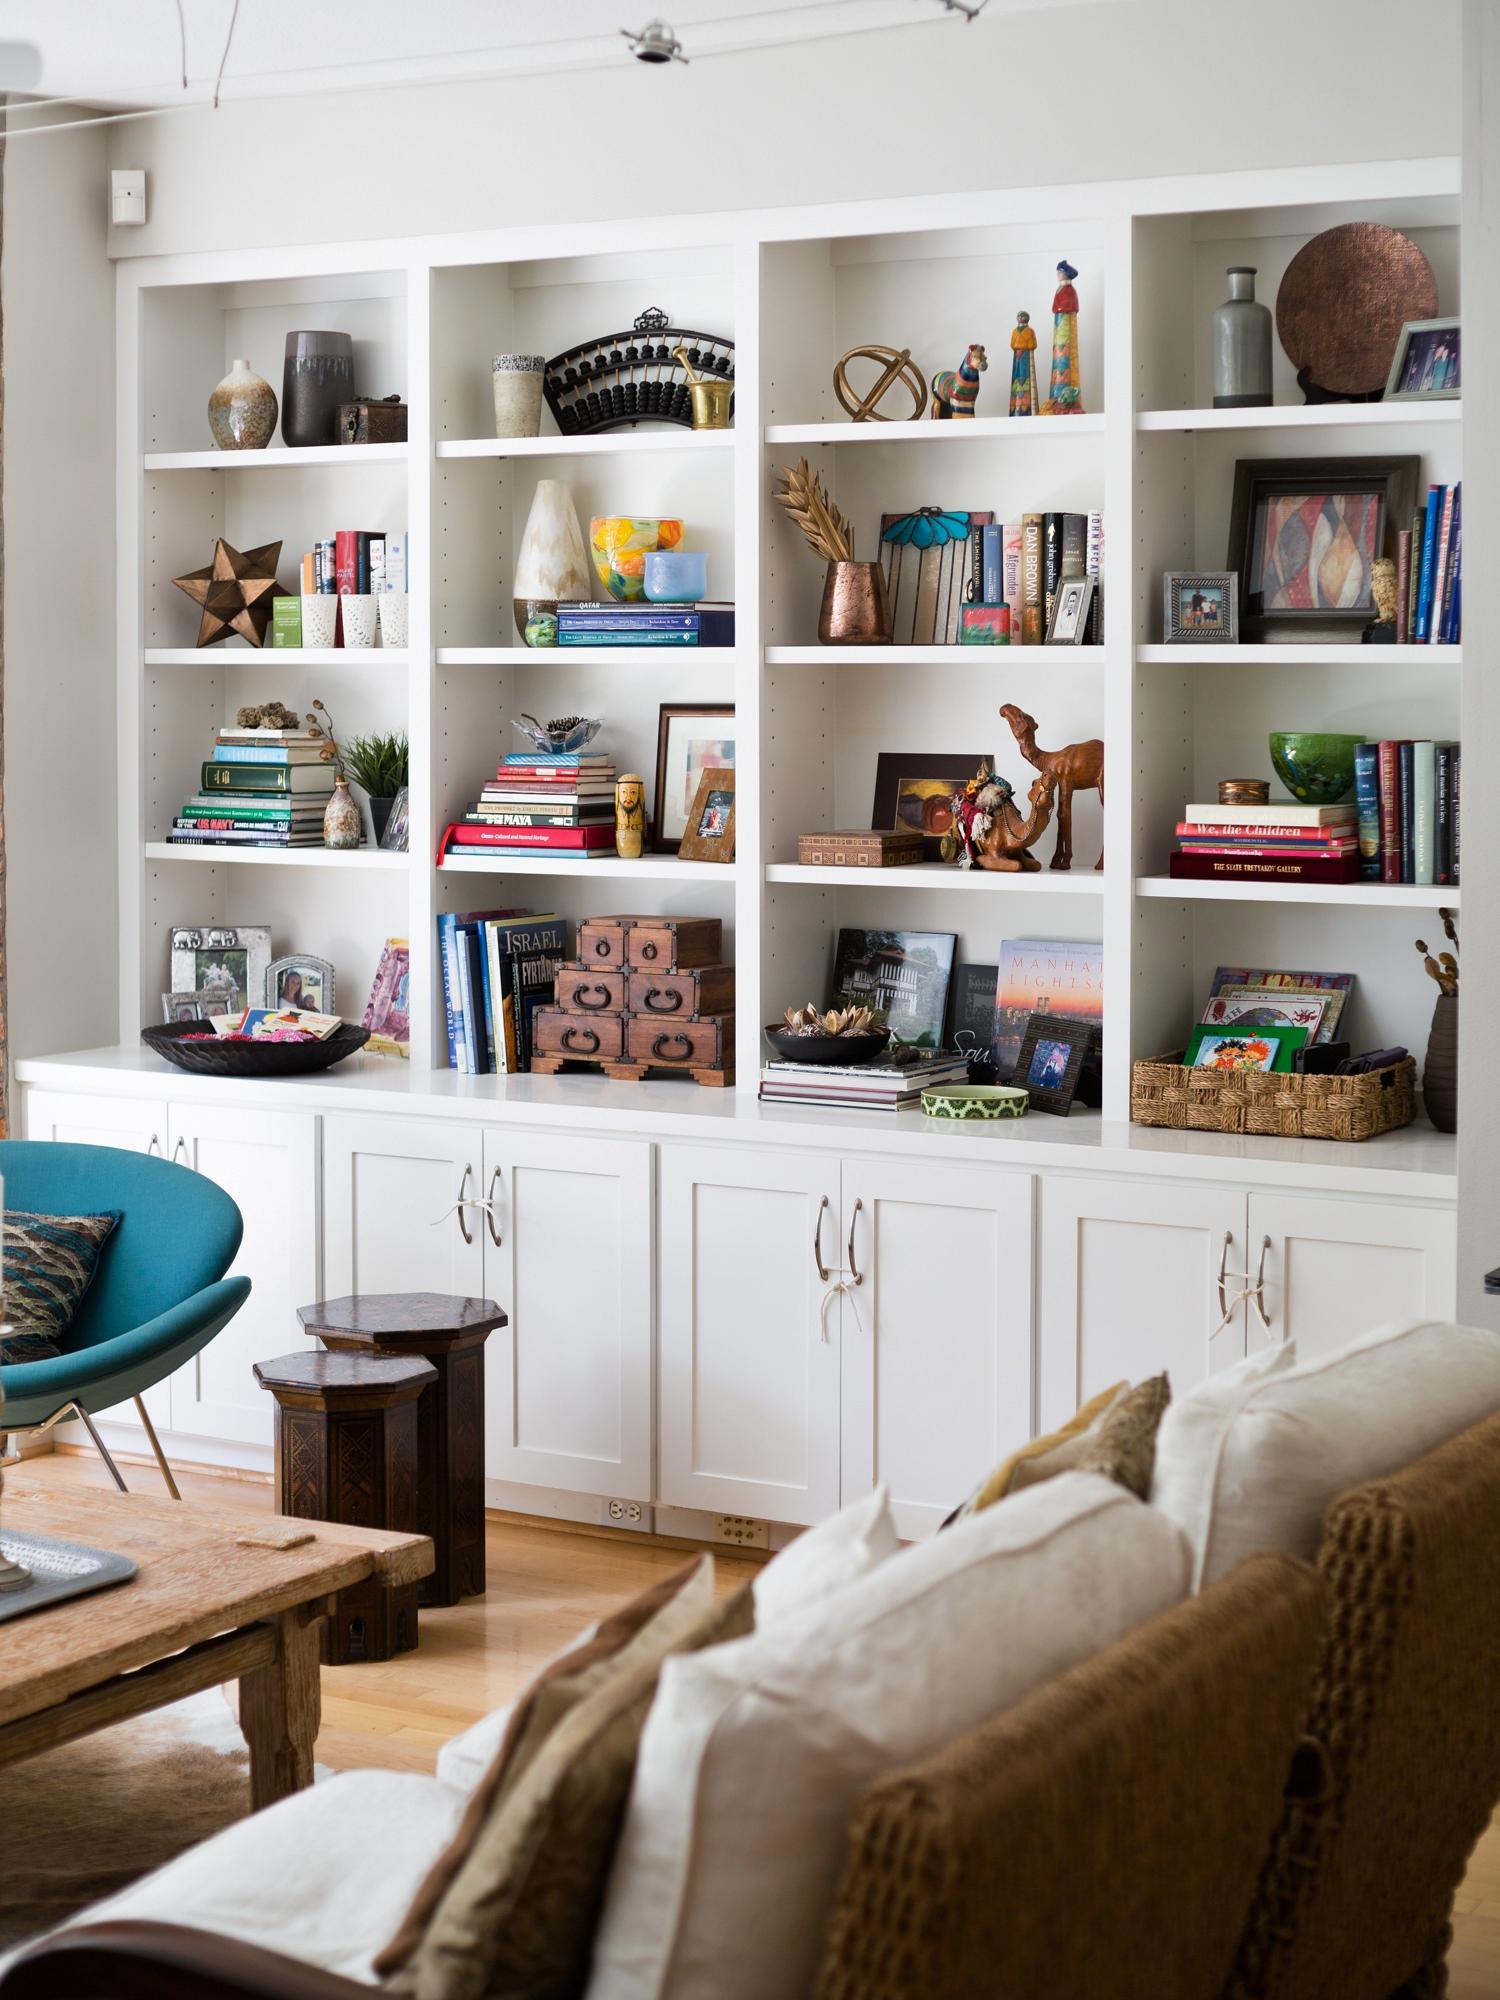 Bookshelf Styling - Carla Aston, Designer / Tori Aston, Photographer